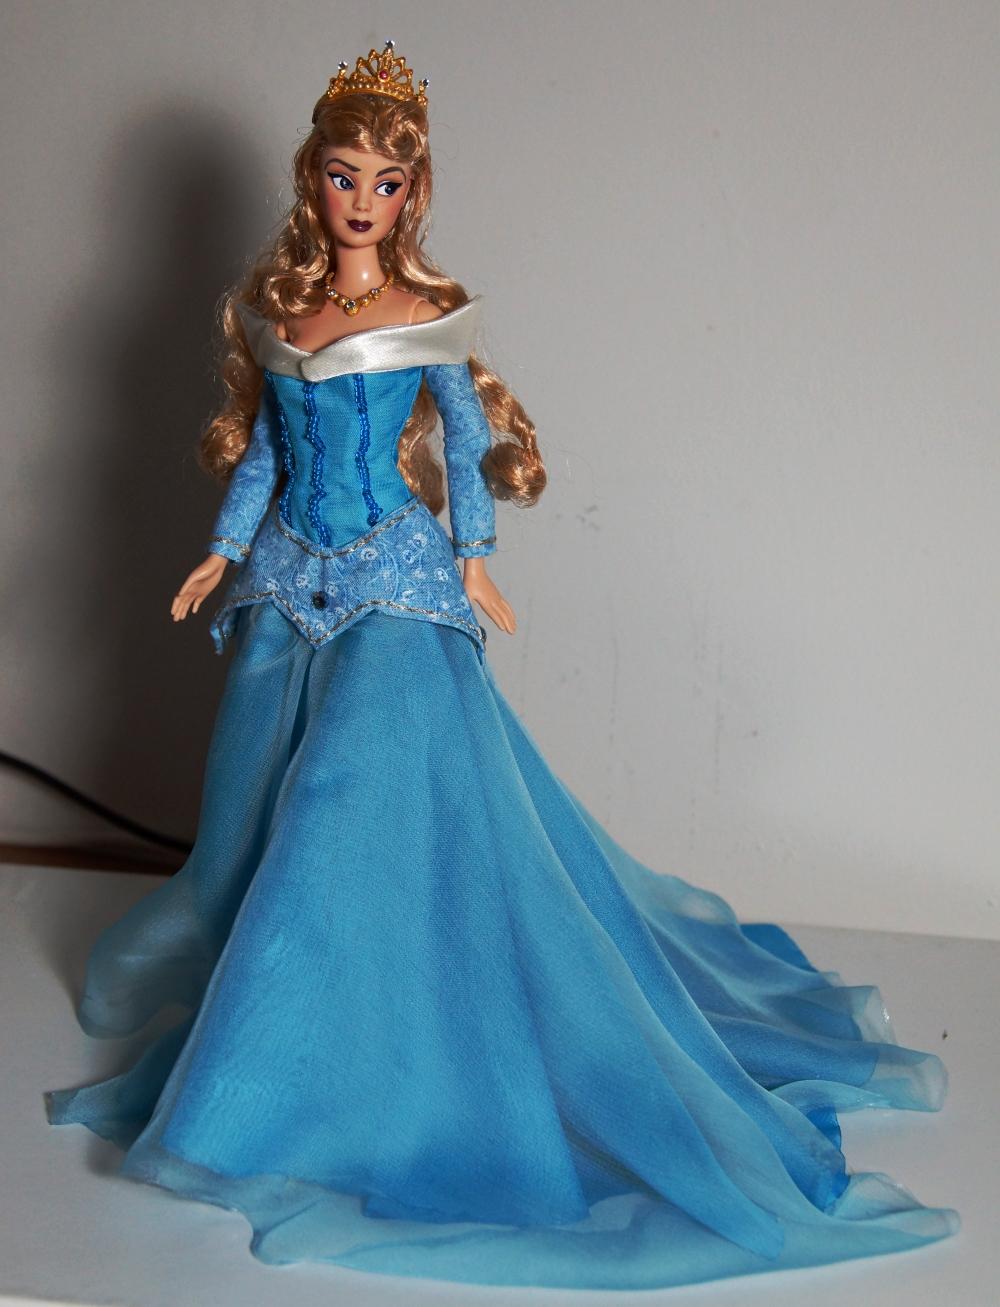 vintage disney barbie eBay